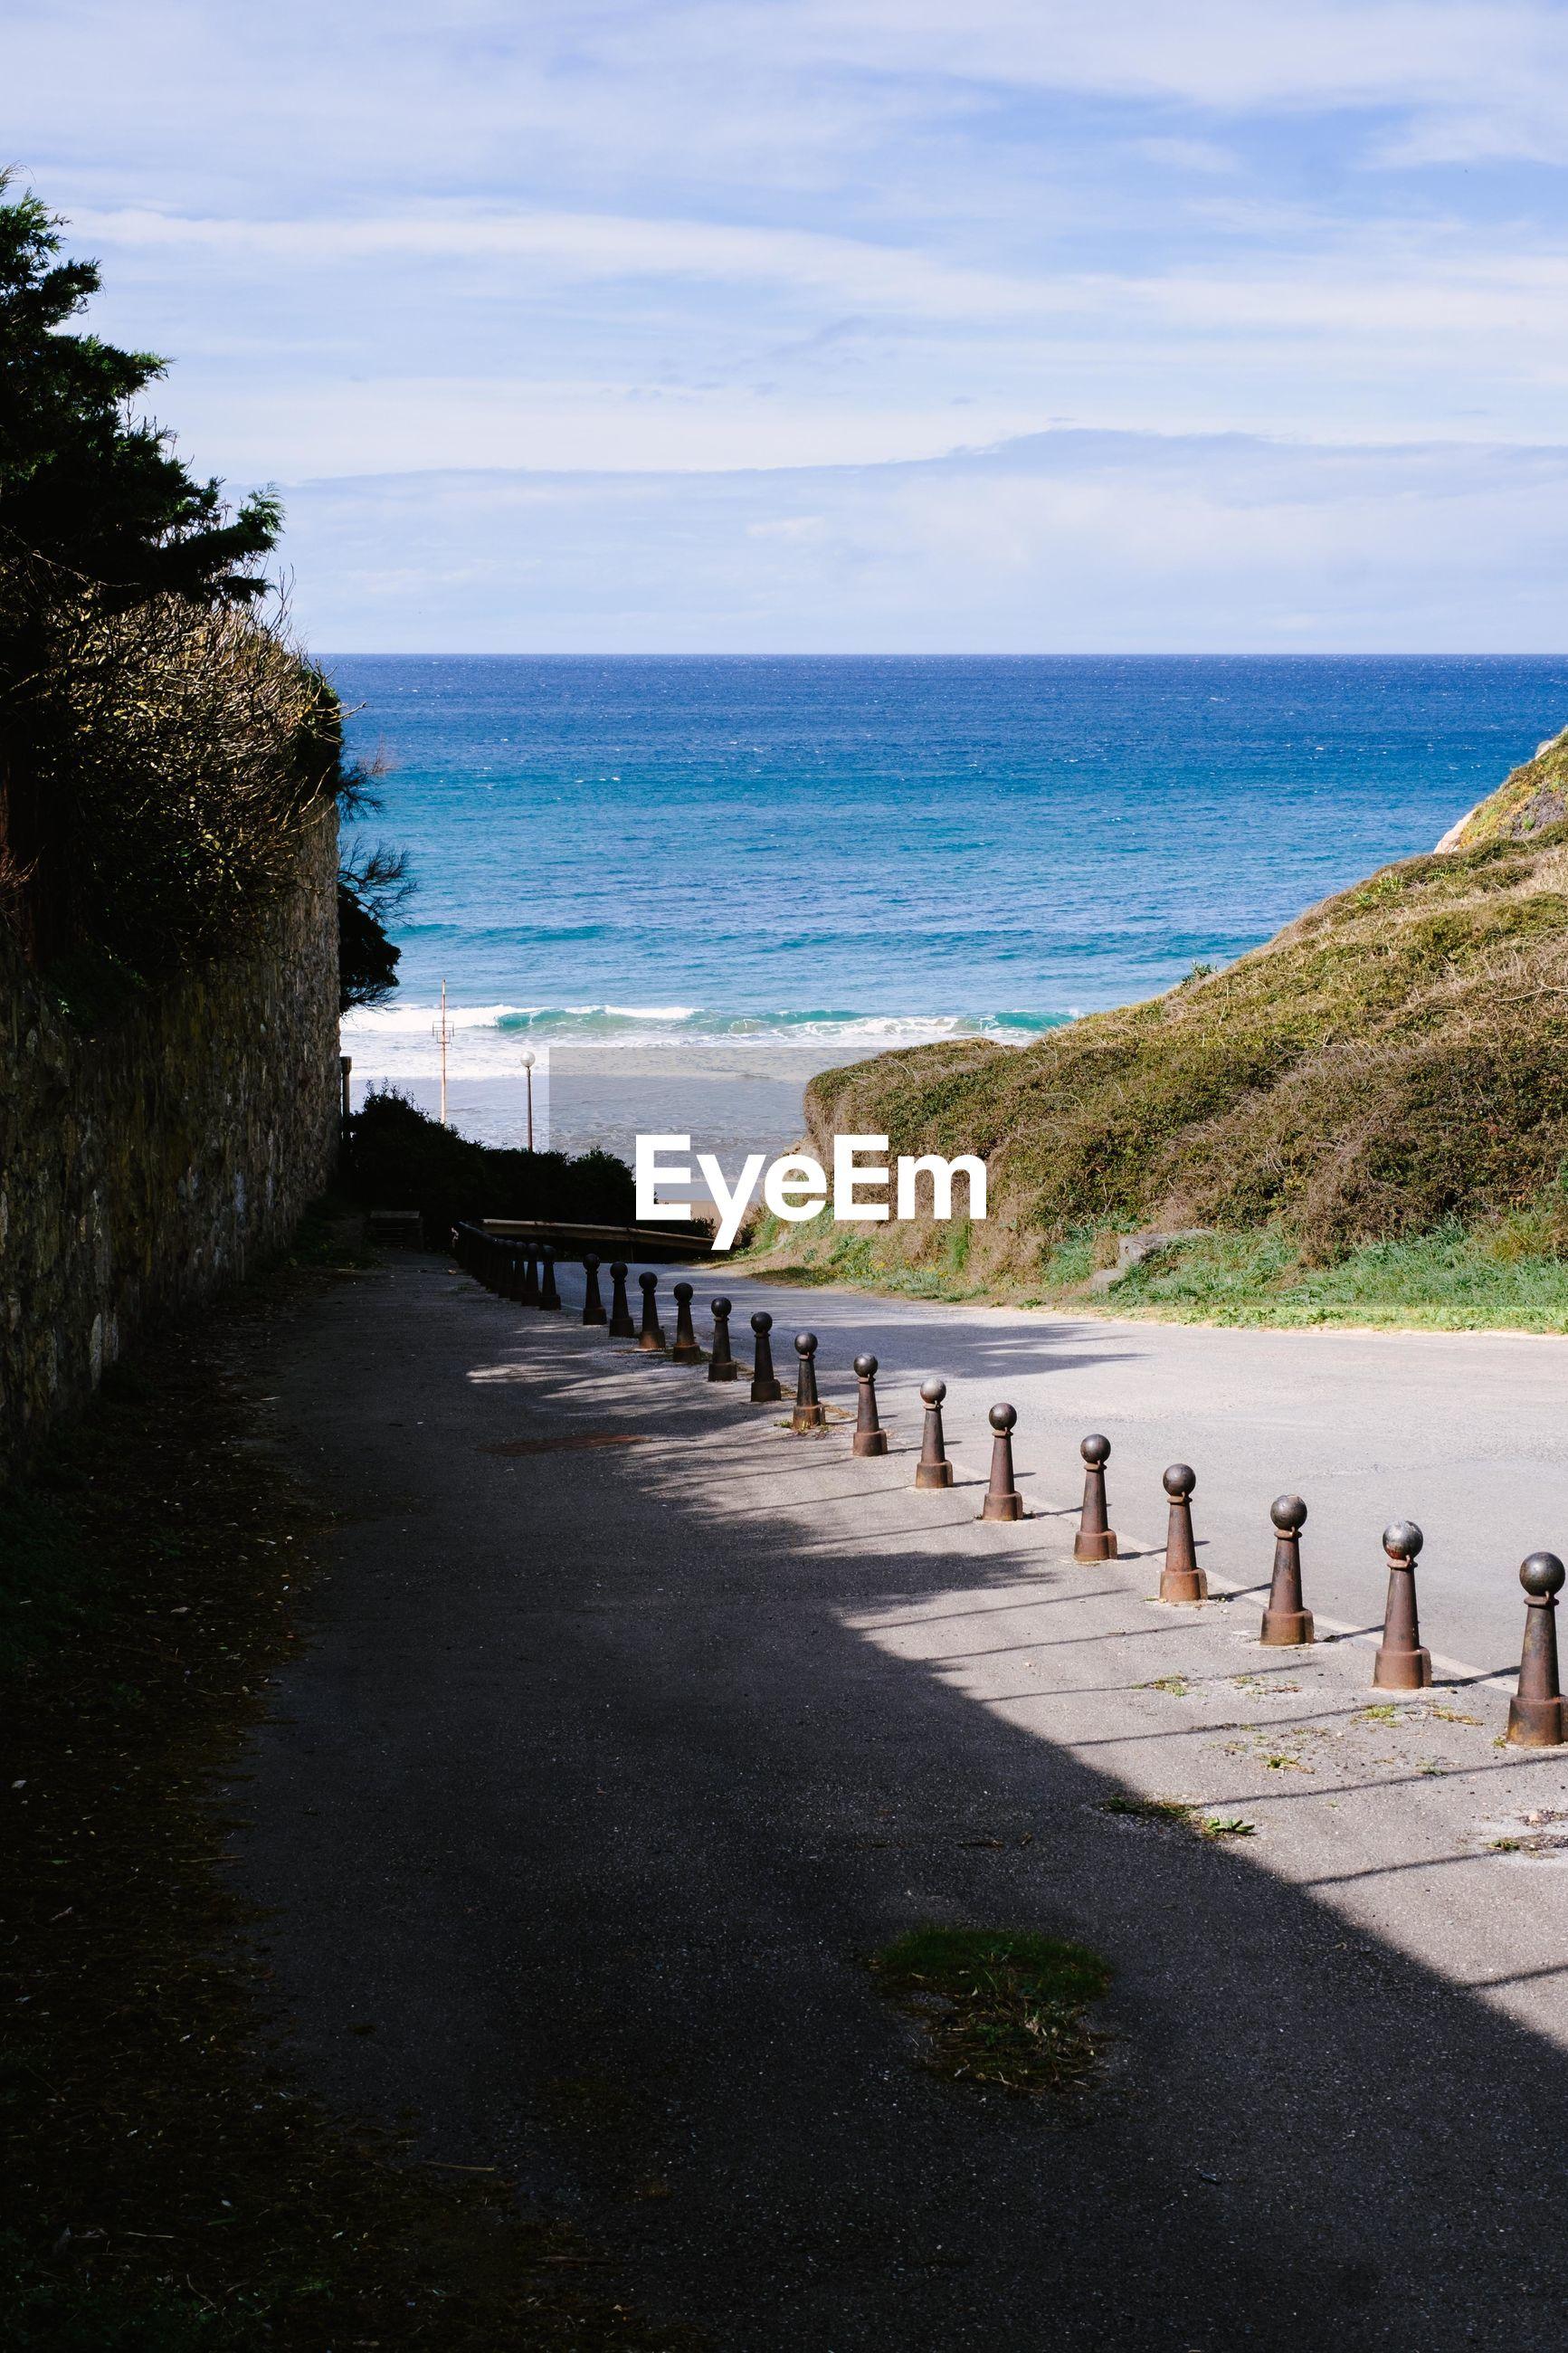 FOOTPATH LEADING TOWARDS SEA AGAINST SKY